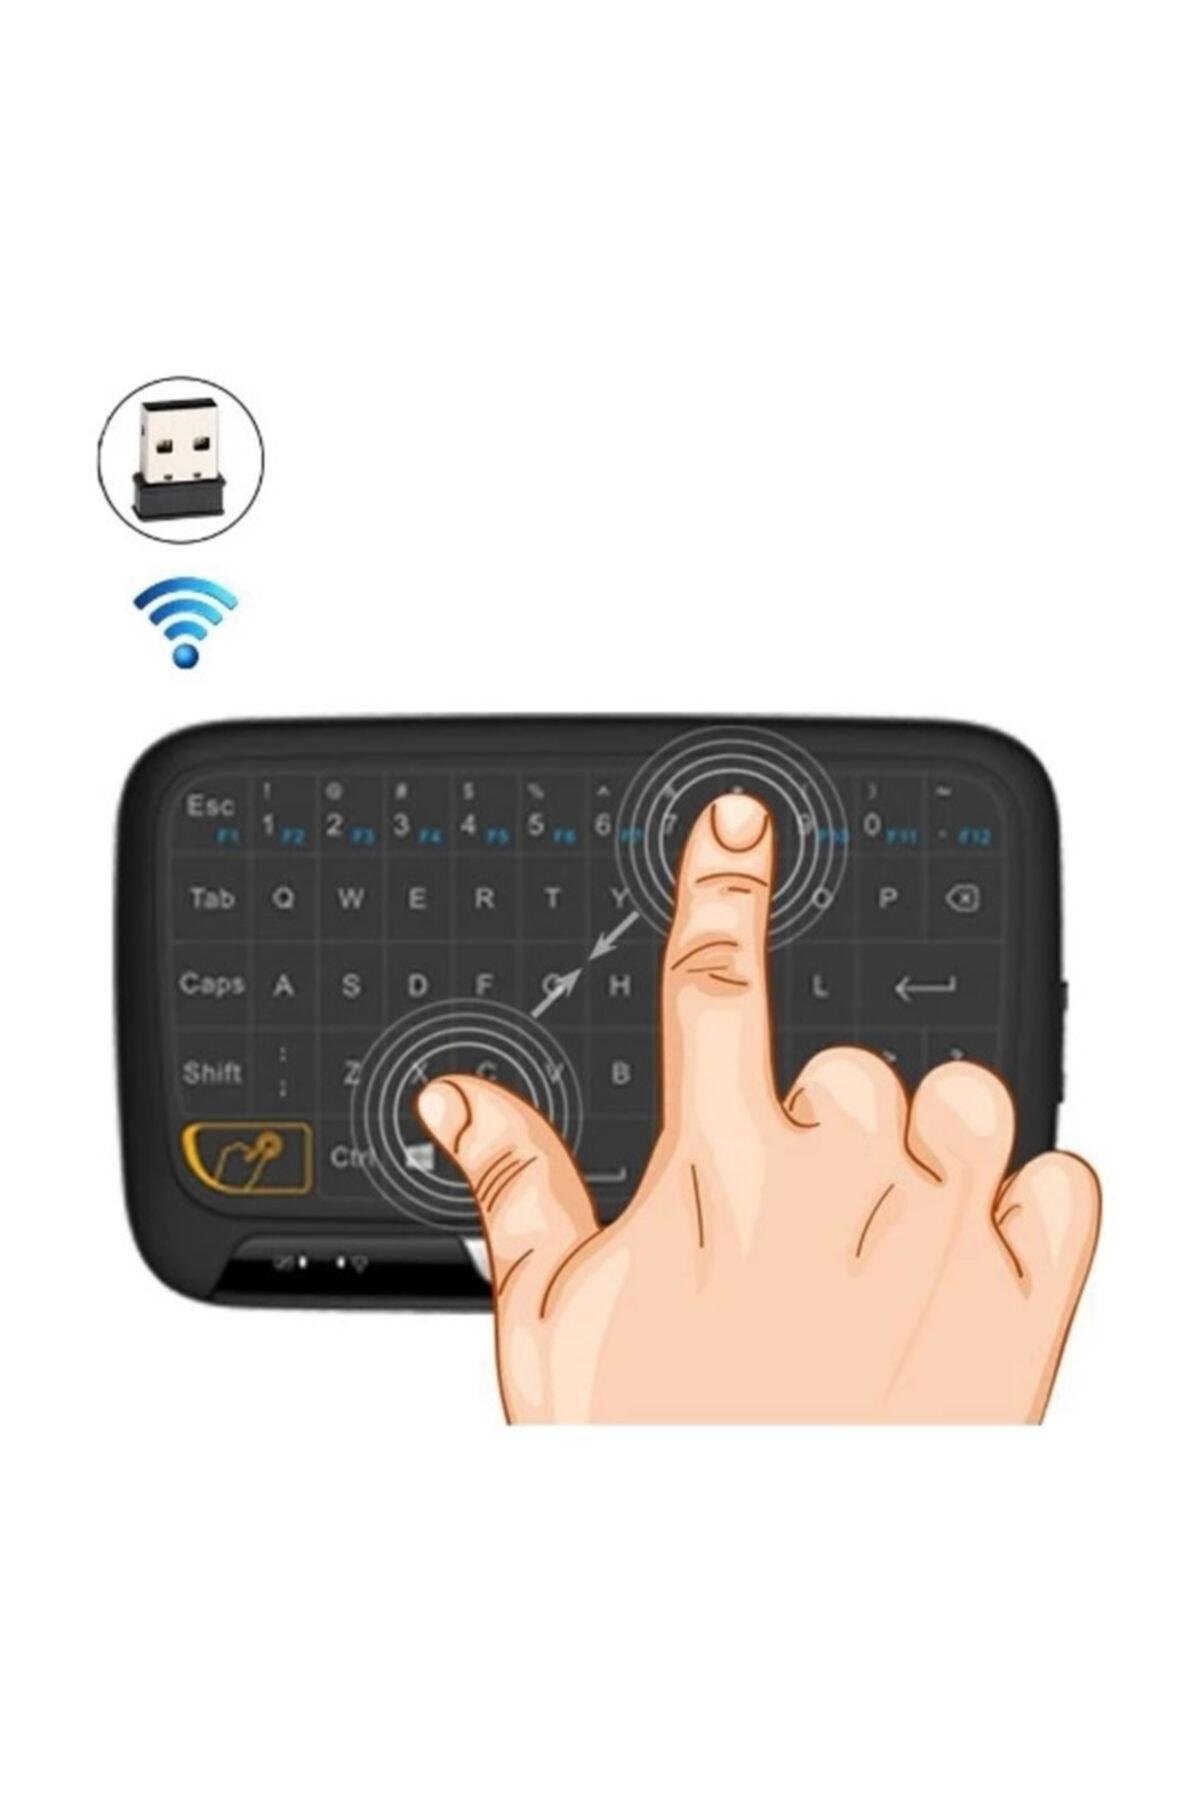 Paleon H18 Kablosuz Mini Klavye Touchpad Şarjlı Smart Tv Dokunmatik Mouse 2